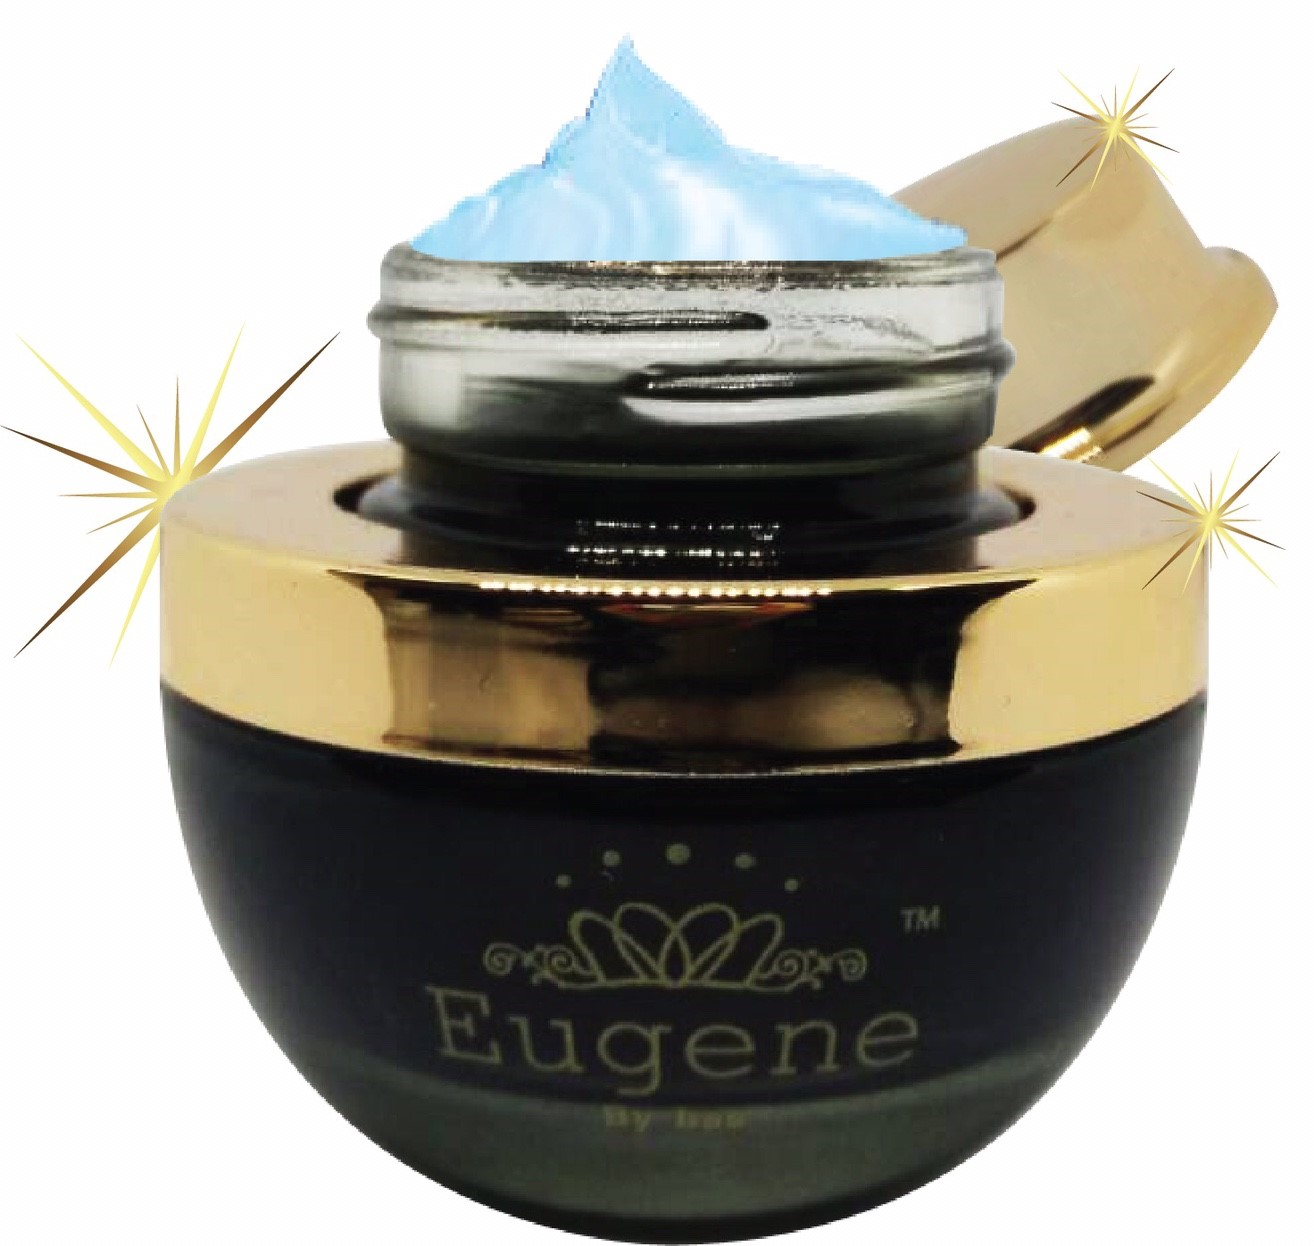 Eugene Bio Premium Booster White ยูจีน ไบโอ พรีเมียม บูสเตอร์ ไวท์